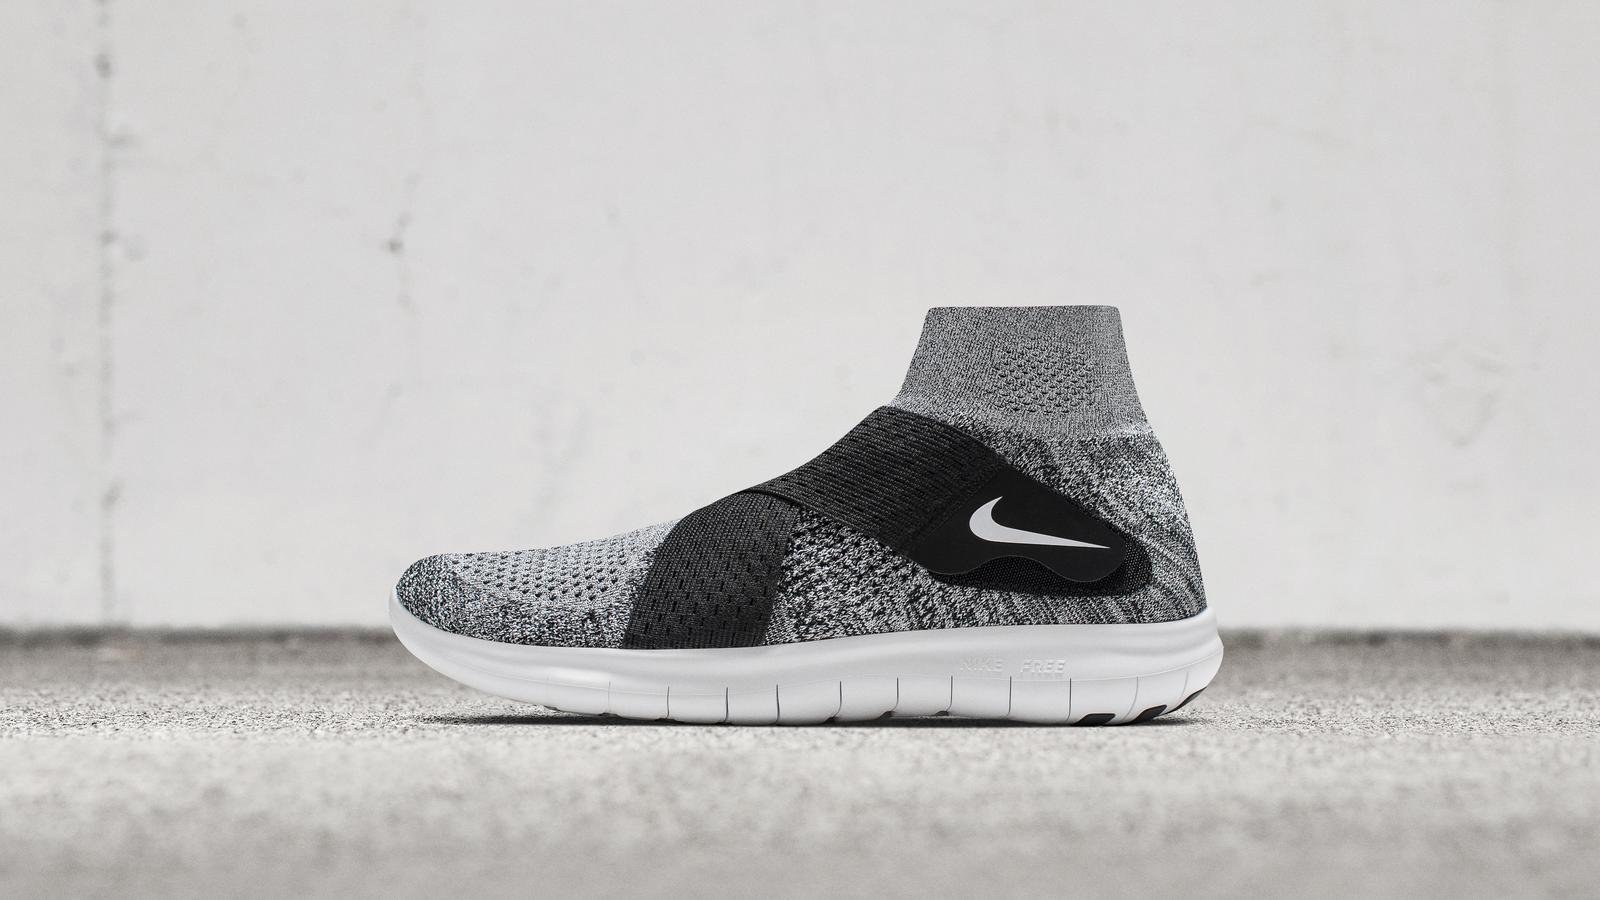 online retailer 368e6 d07c8 Nike Free RN Motion 2 Flyknit 0